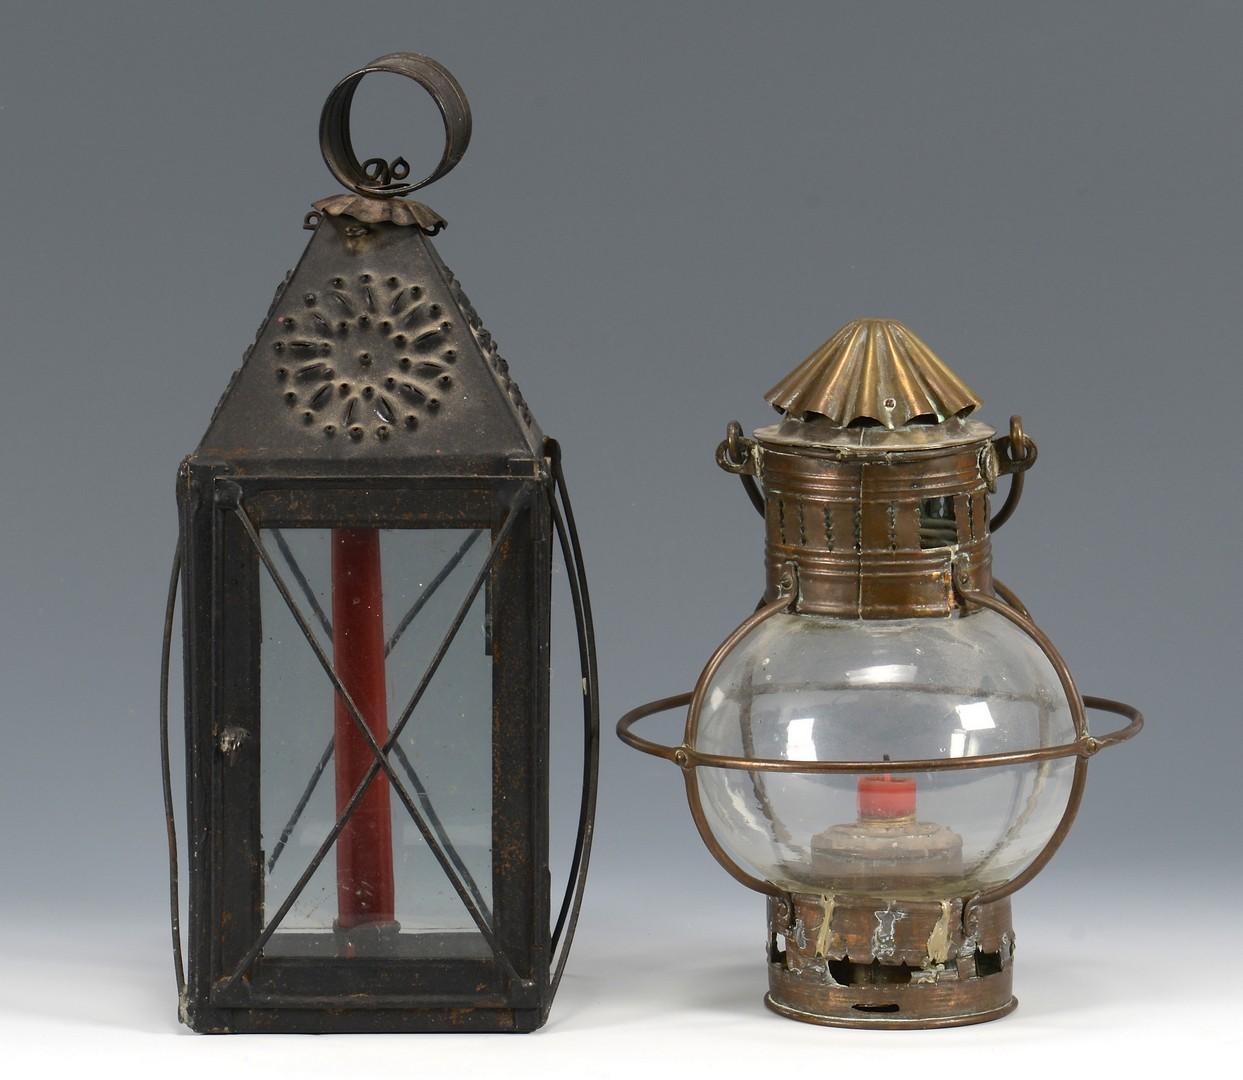 Lot 673: Primitive lighting, charger, hooks, 7 items